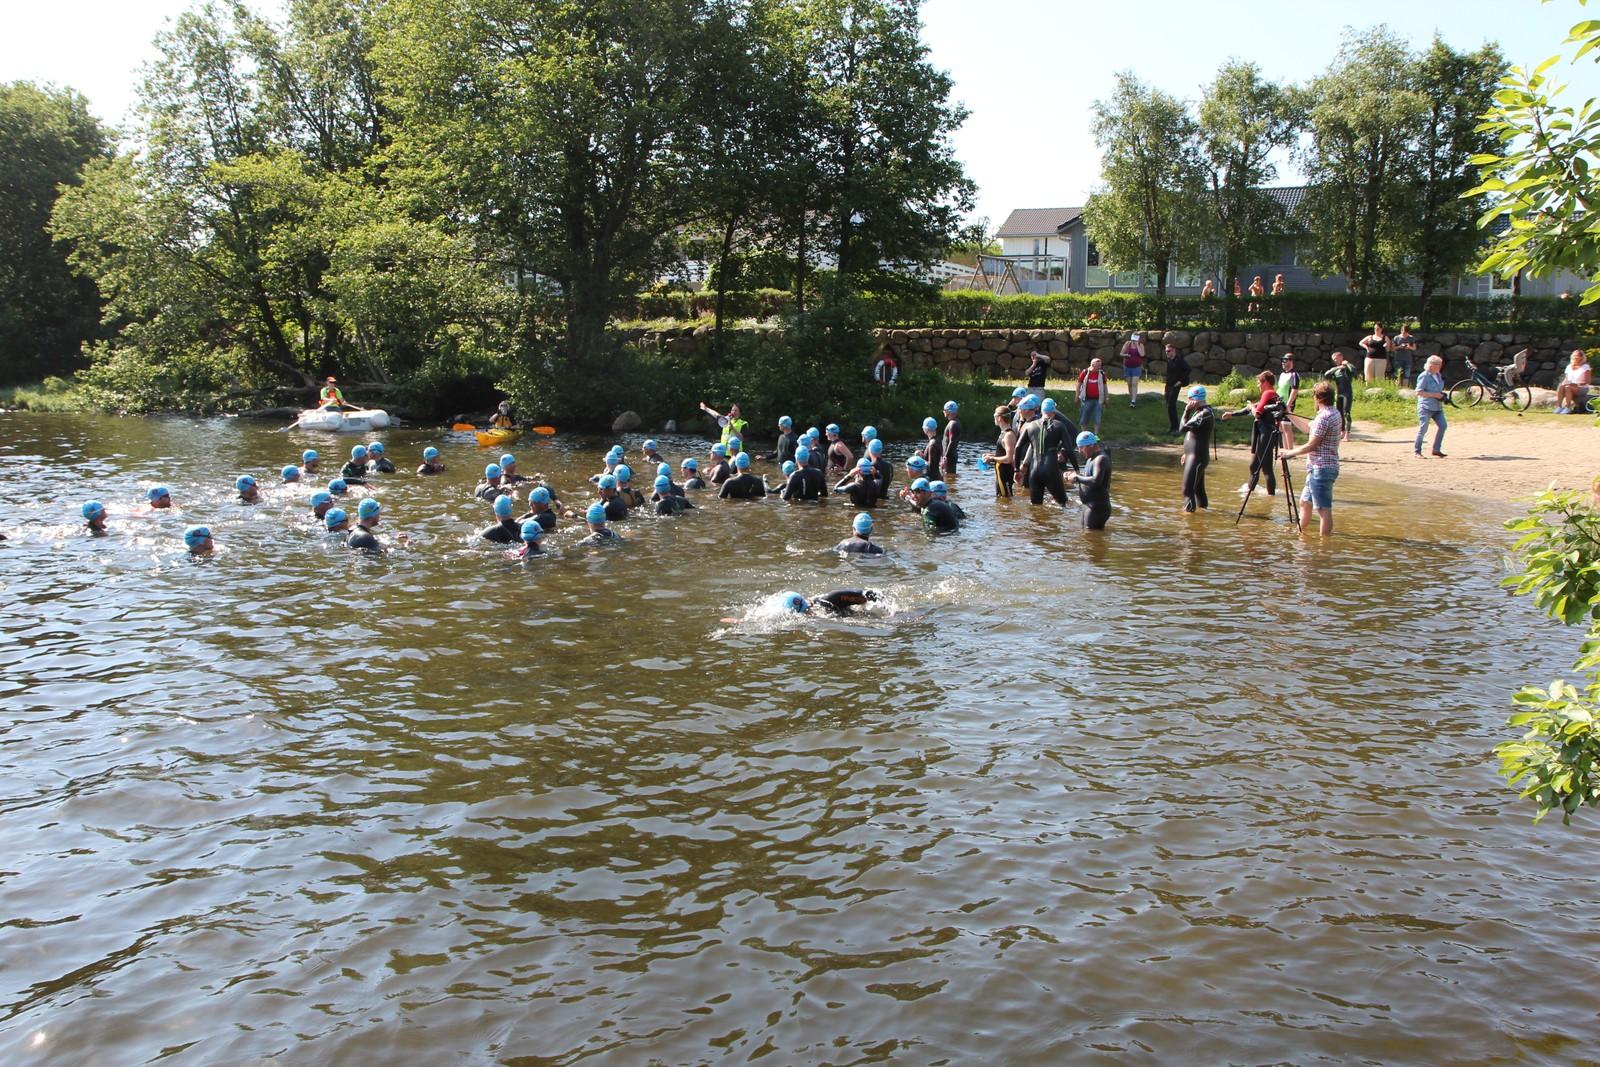 Første øvelse var svømming i Eivindholstjødna